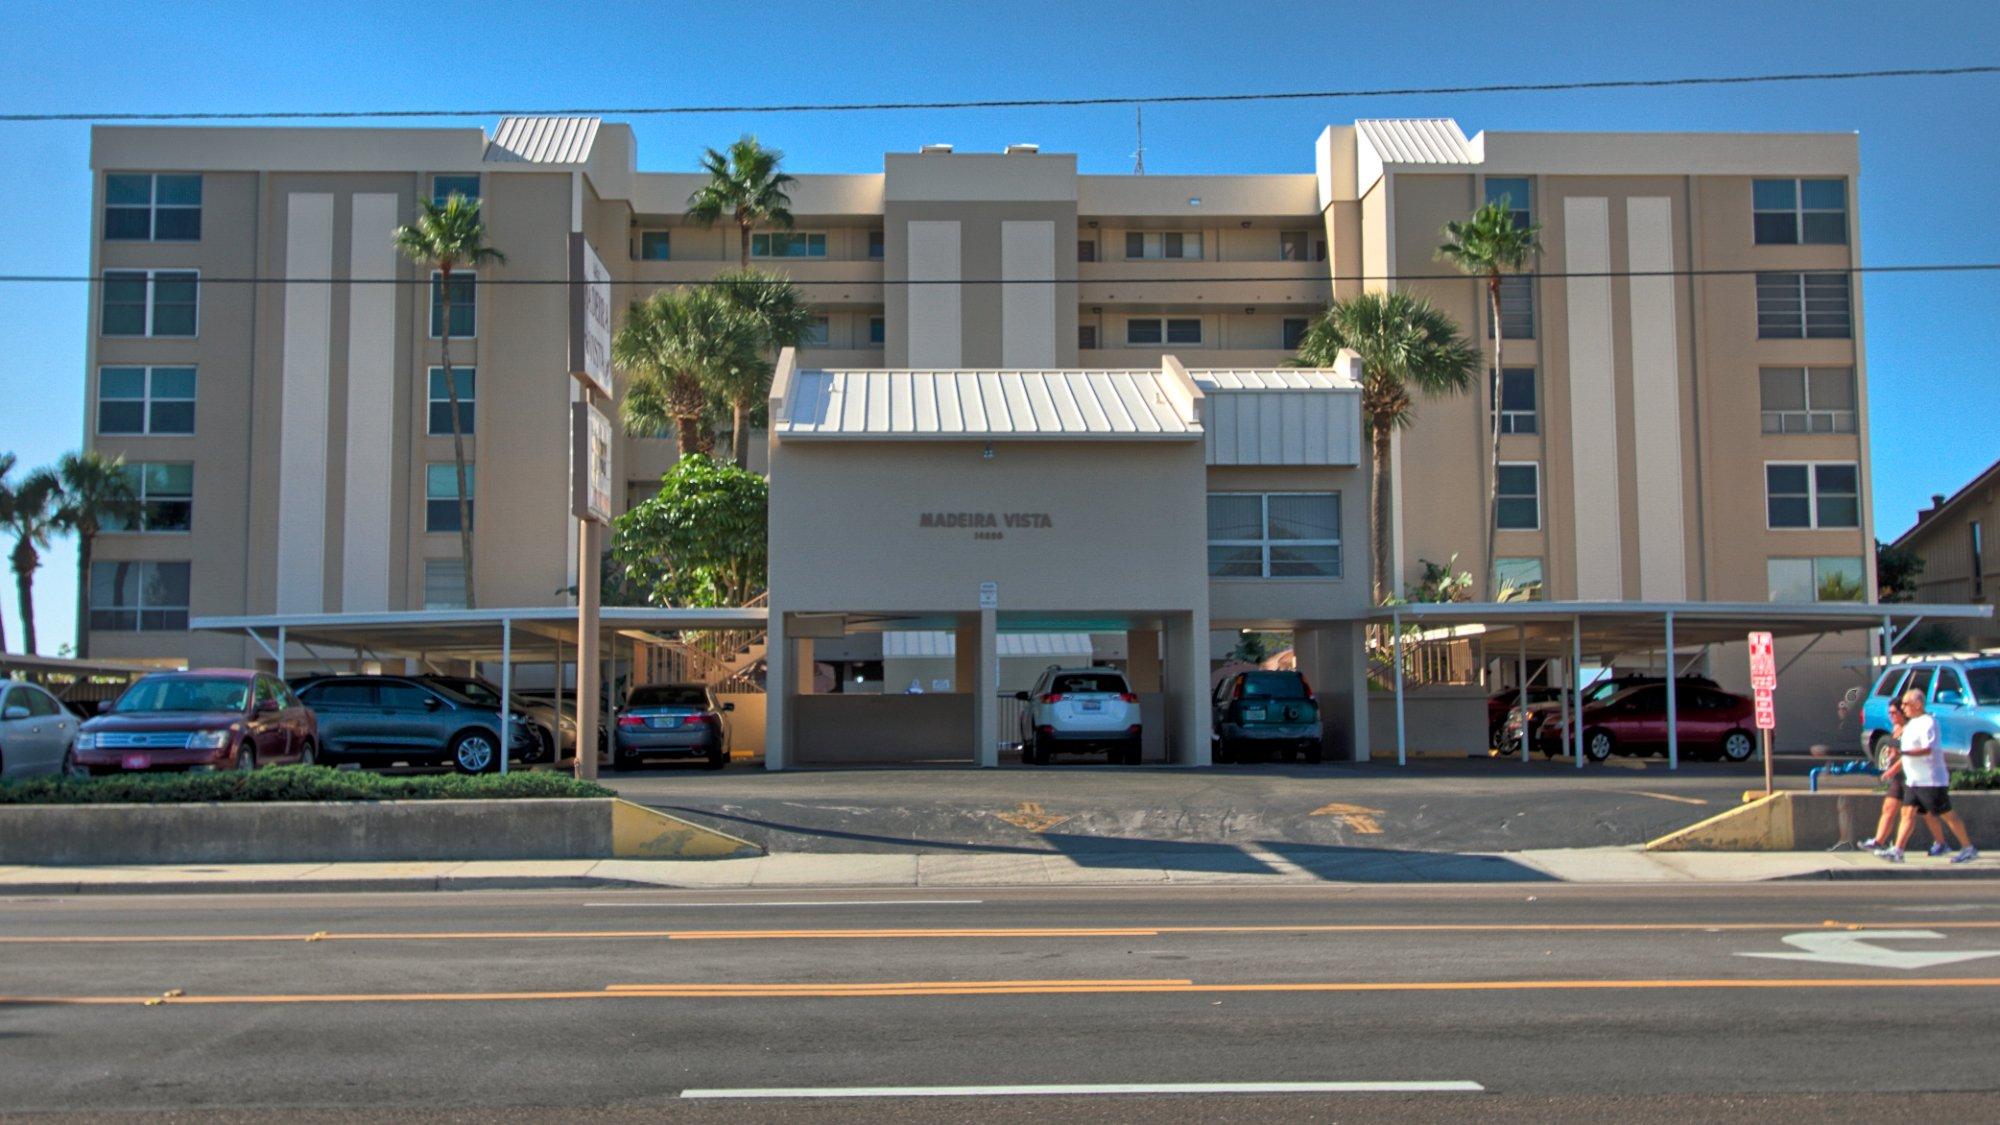 Madeira Vista Condominiums